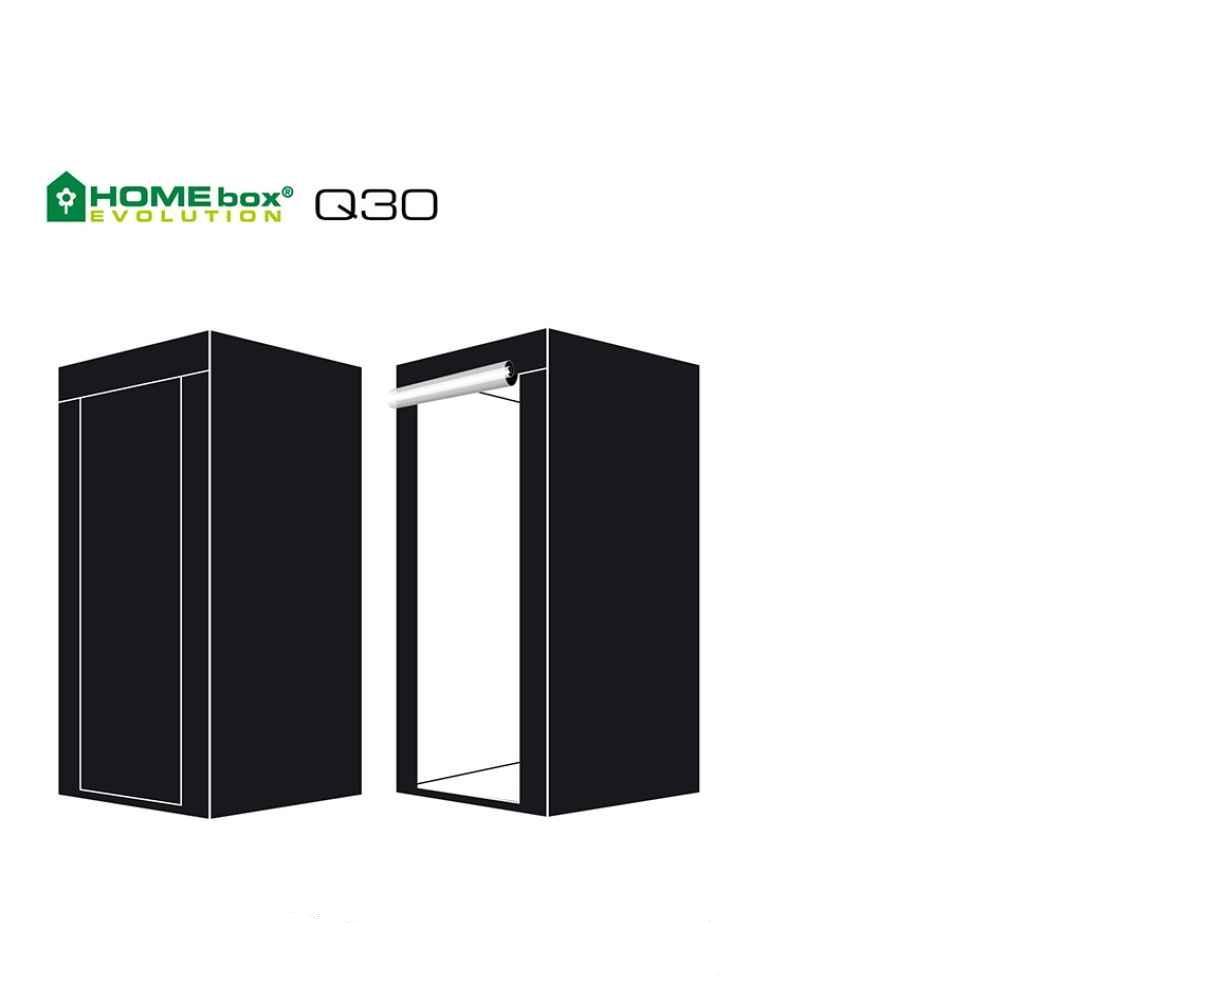 Homebox Evoluion Q30 30x30x60cm